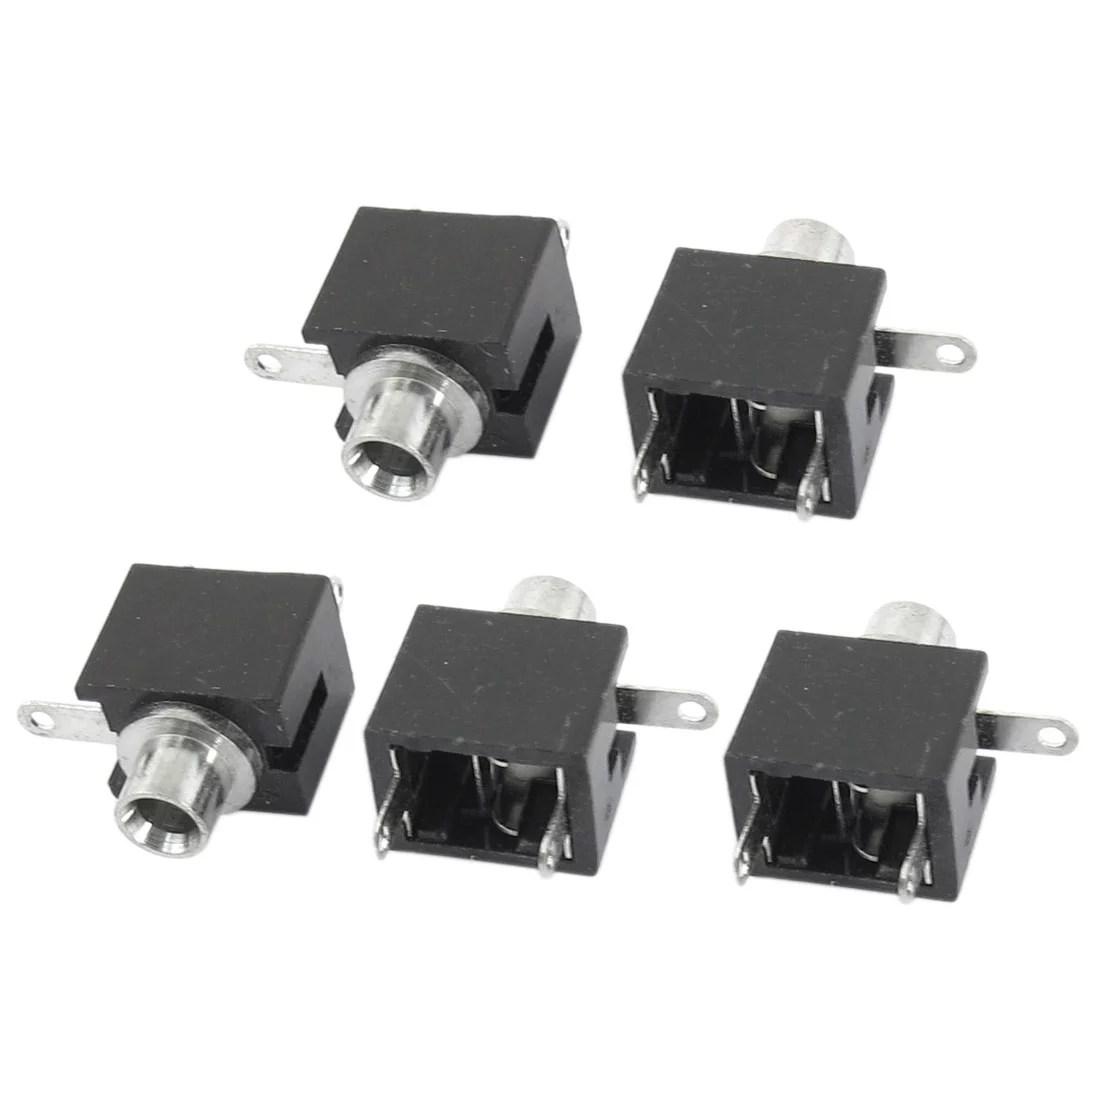 hight resolution of 5pcs 3 5mm mono female socket audio jack soldering pcb panel mount5pcs 3 5mm mono female